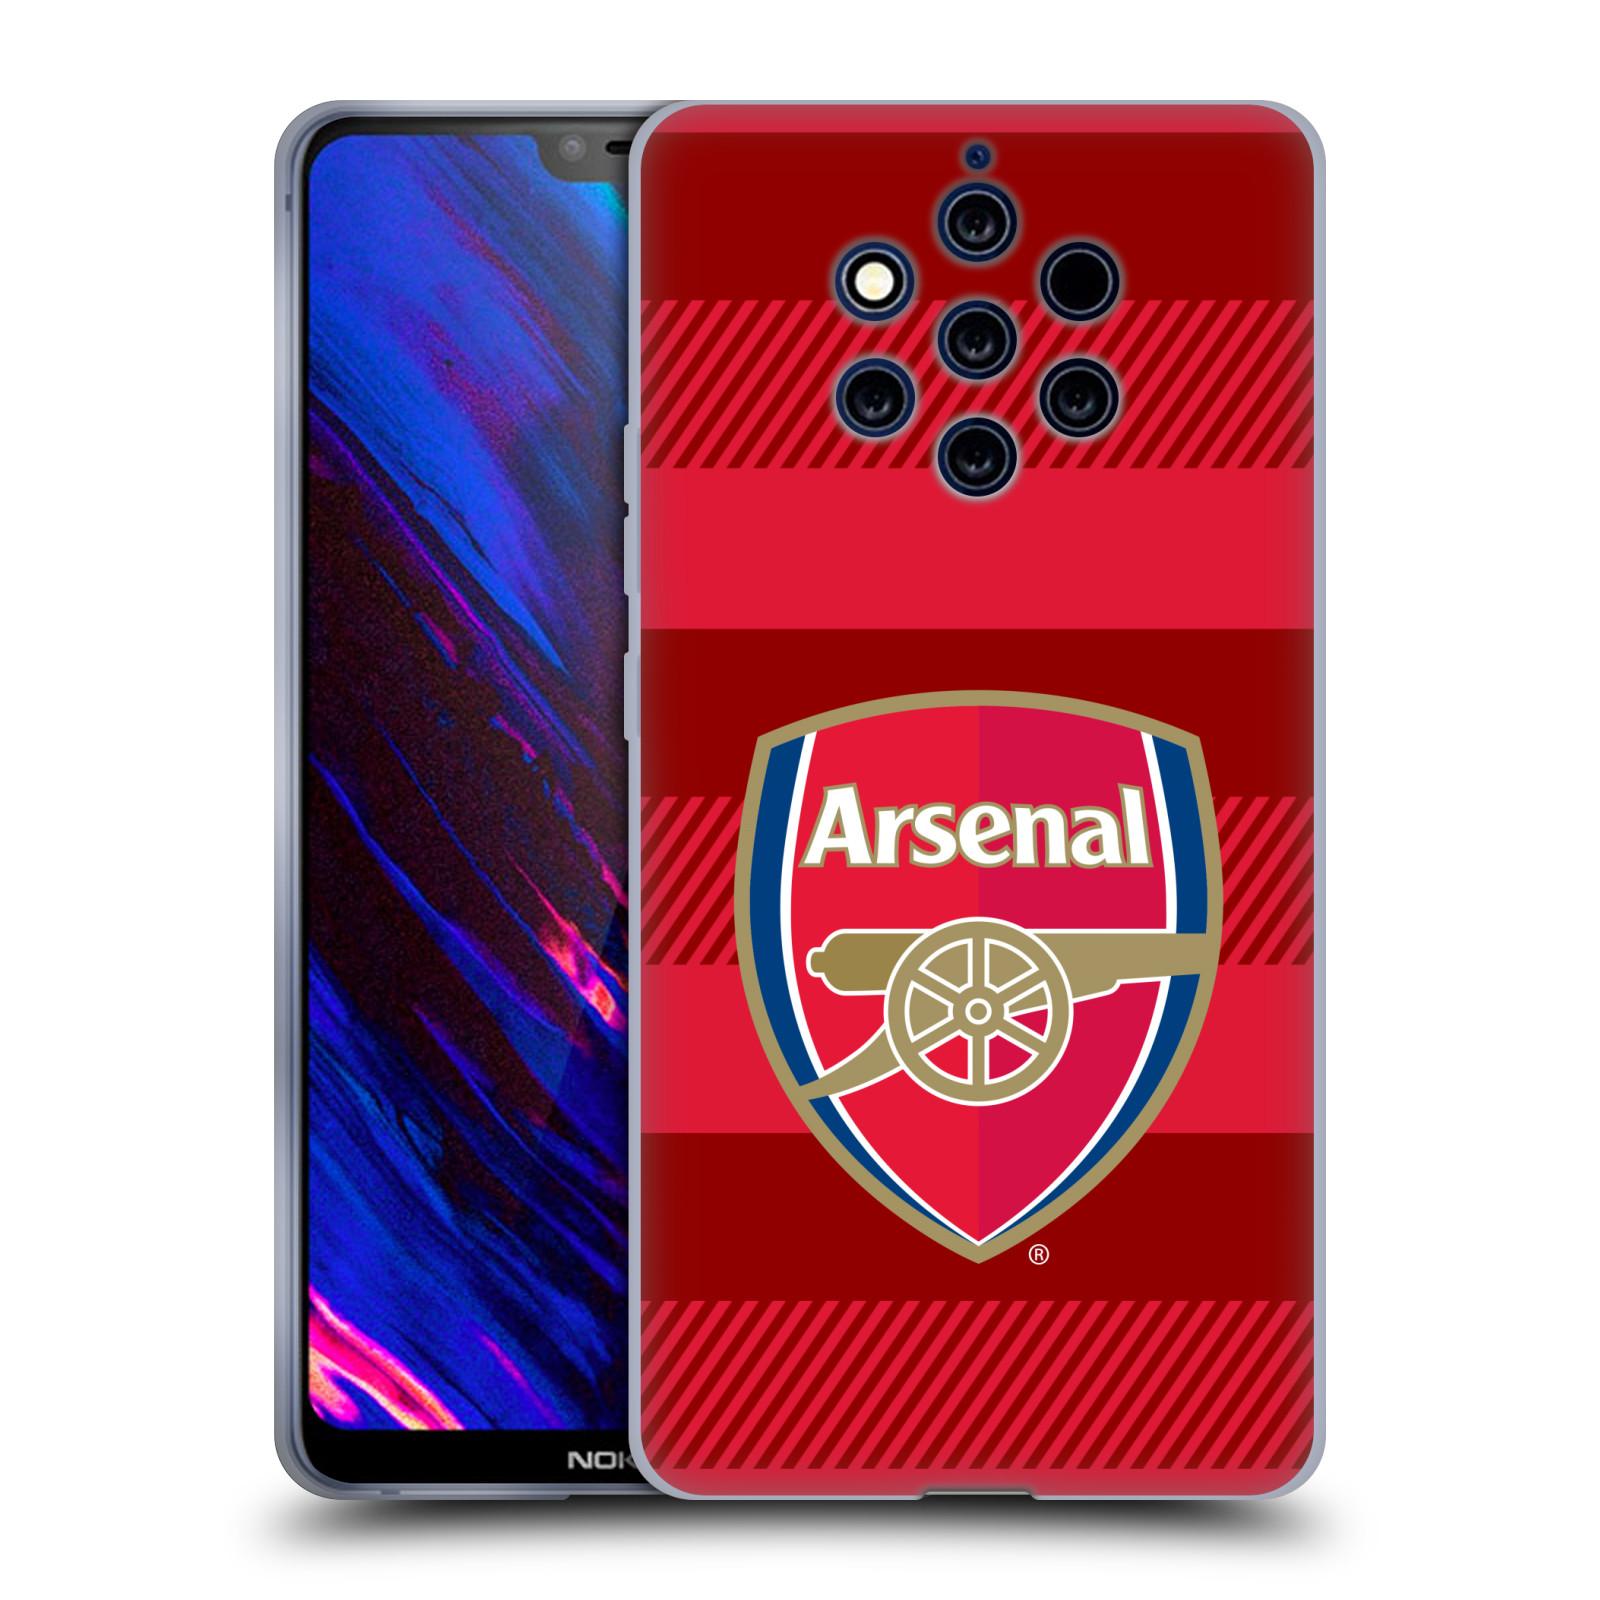 Silikonové pouzdro na mobil Nokia 9 PureView - Head Case - Arsenal FC - Logo s pruhy